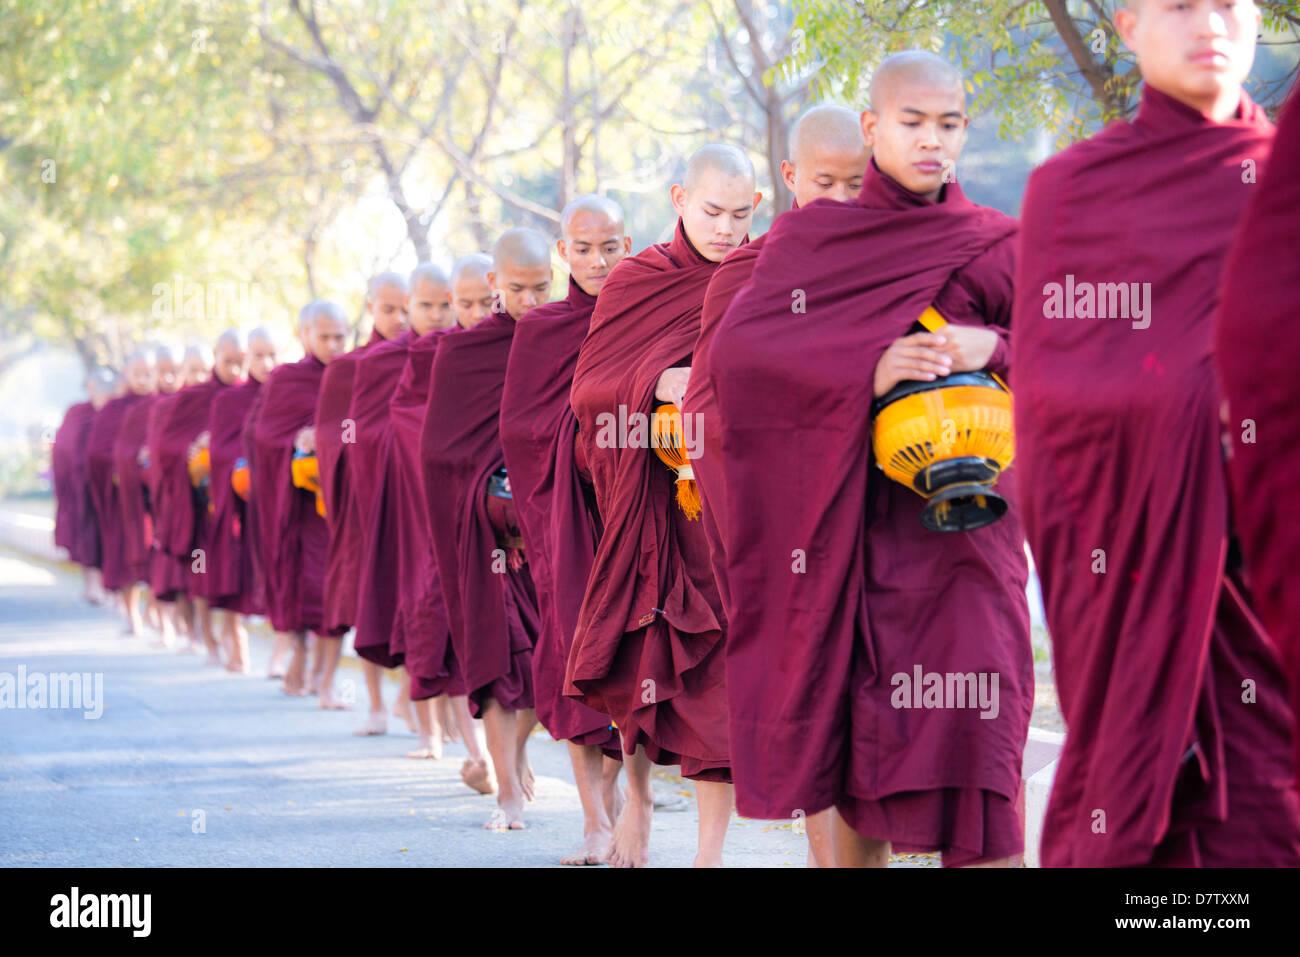 Buddhist monks walking along road to collect alms, near Shwezigon Paya, Nyaung U, Bagan, Burma Stock Photo